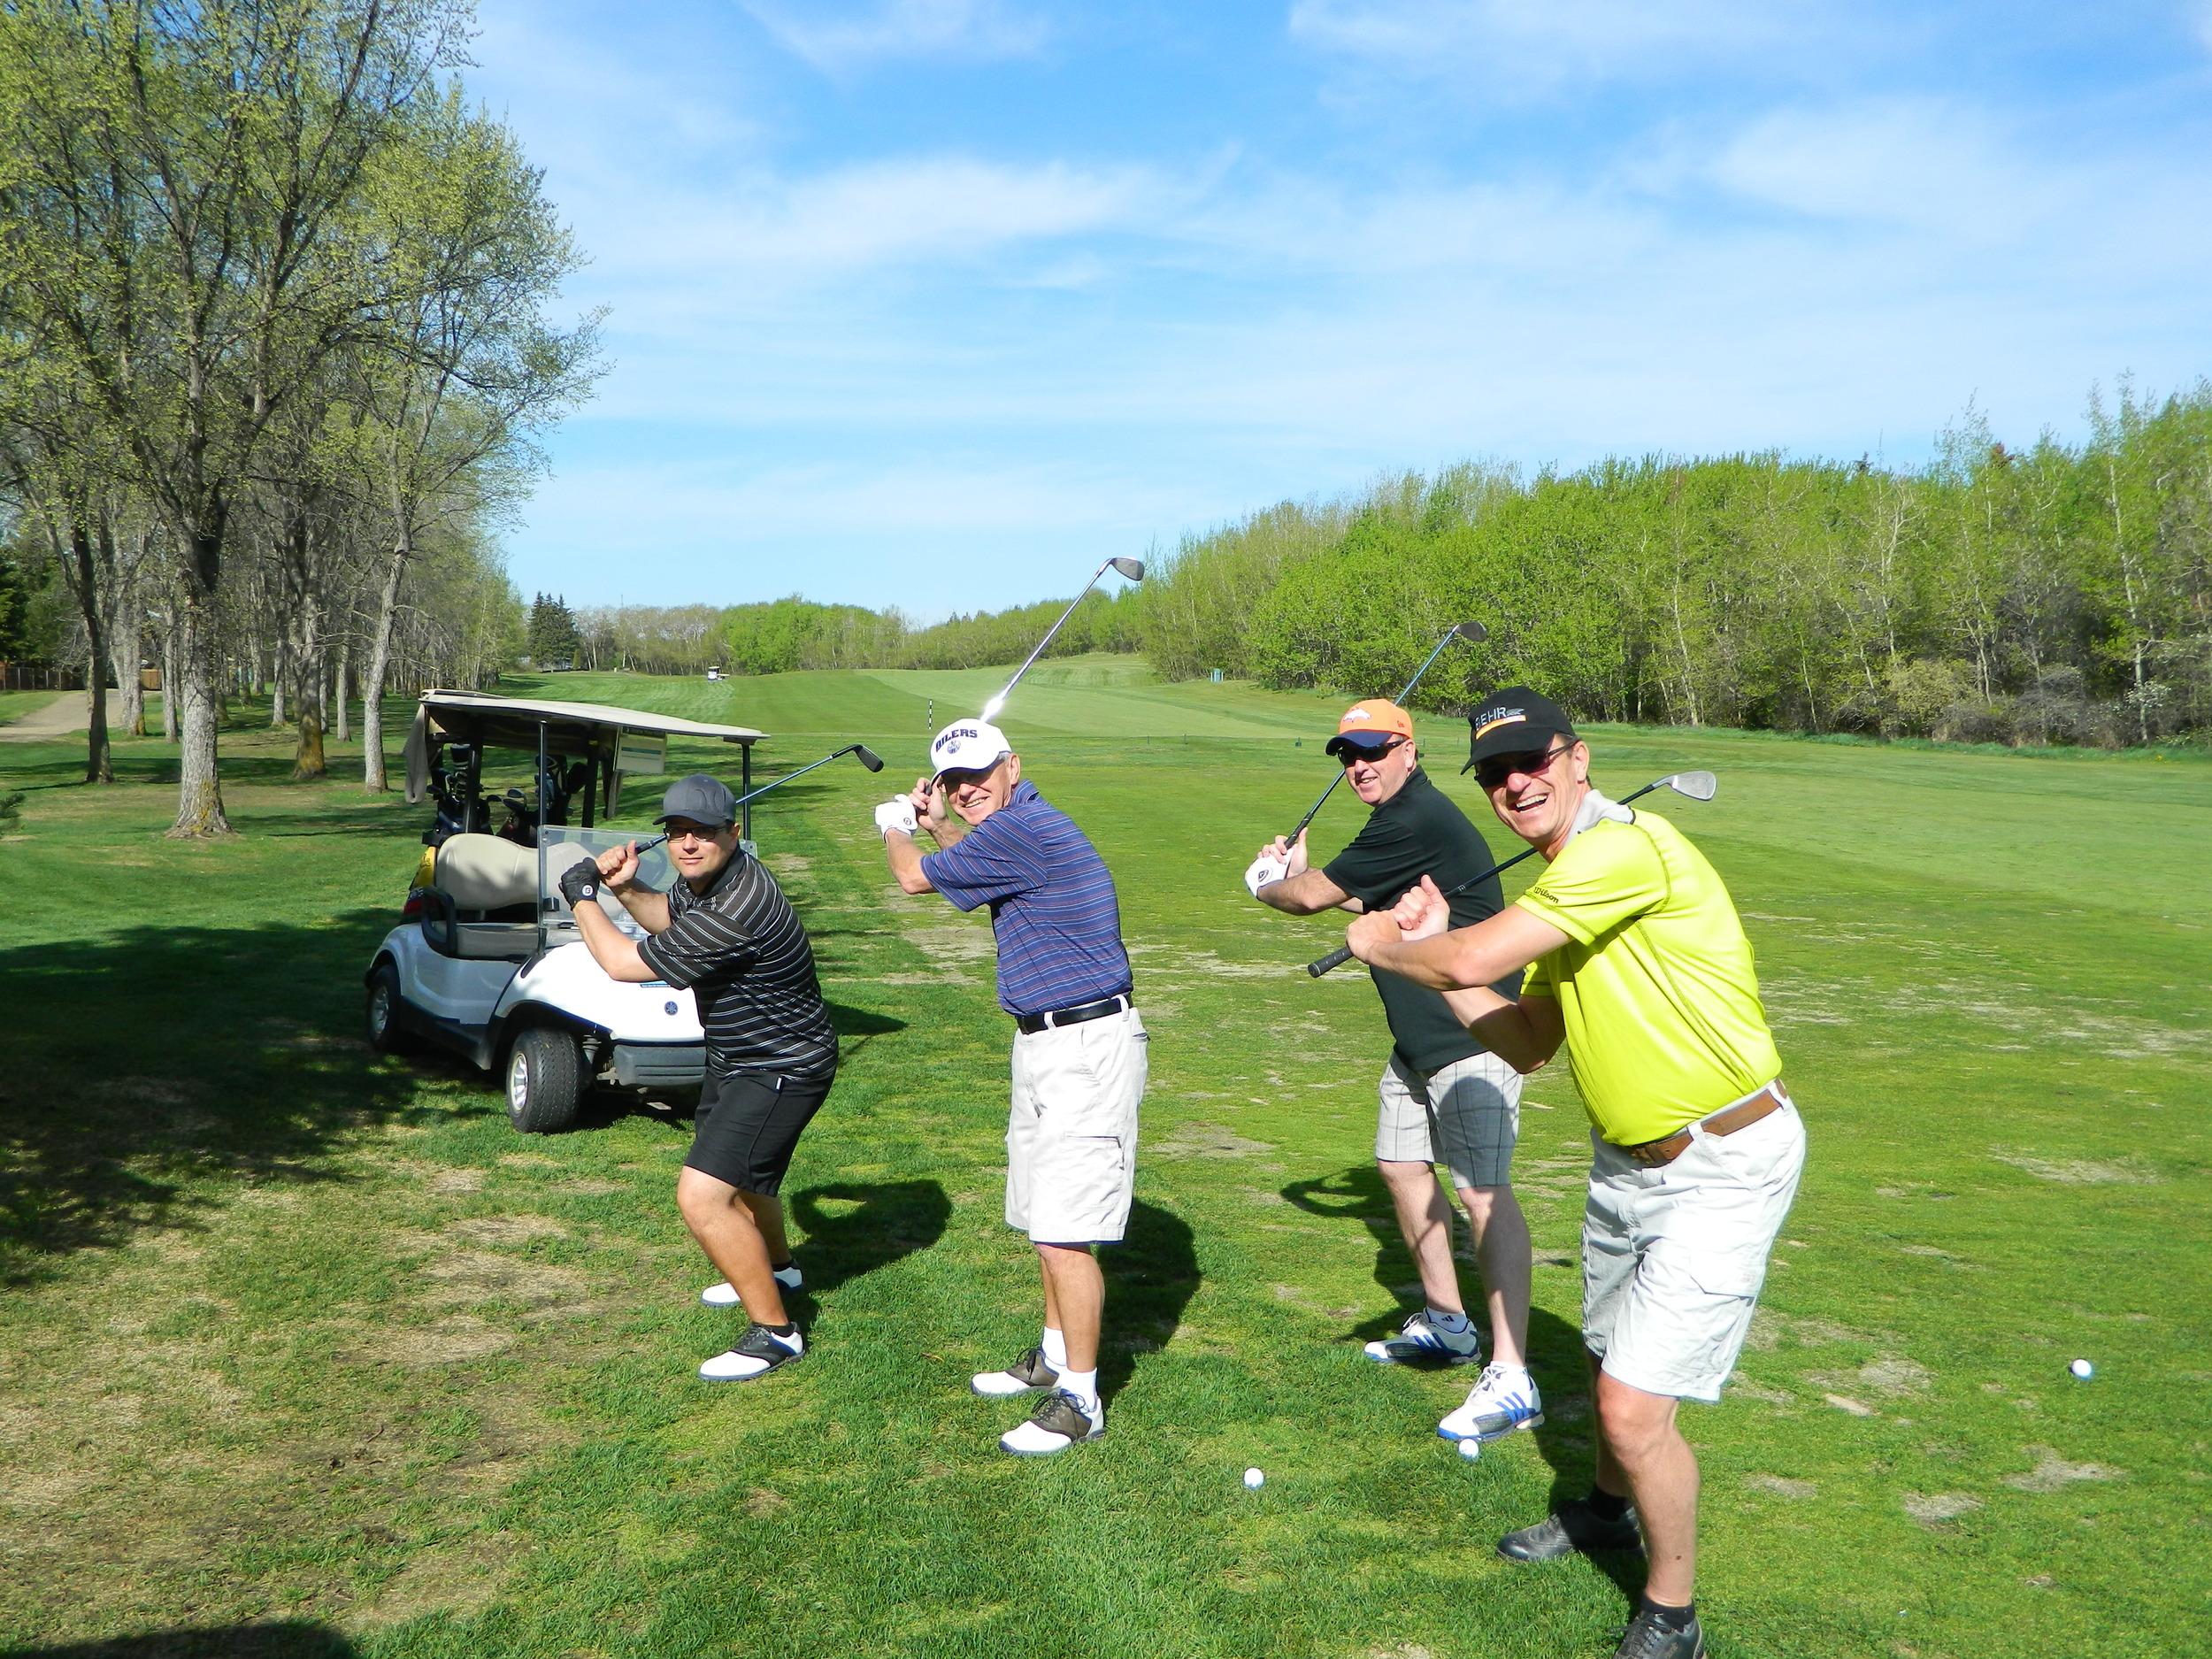 204 golfer pictures 005.jpg